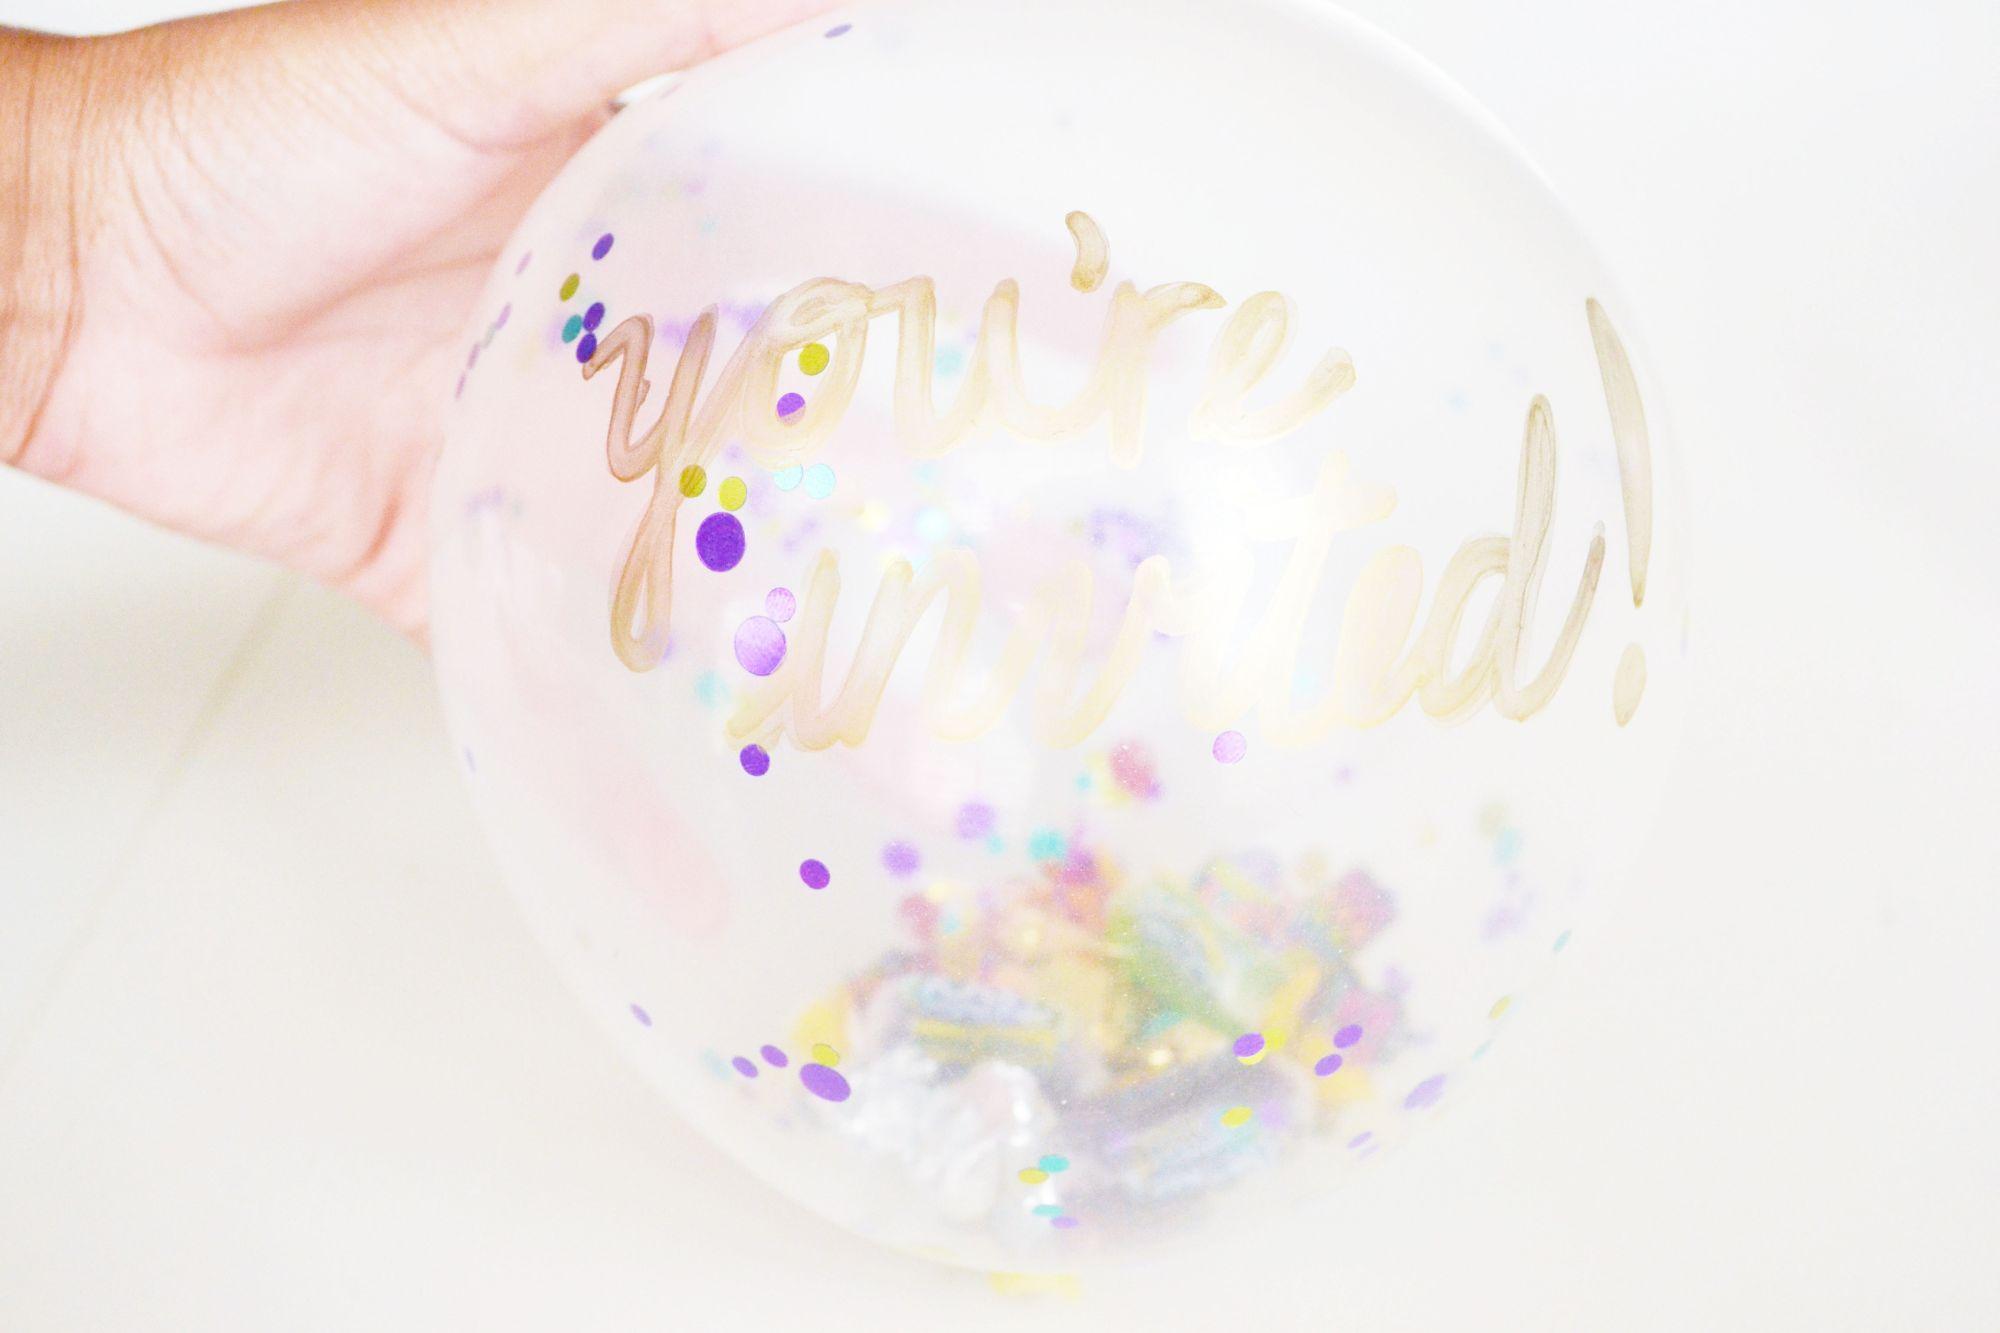 DIY Confetti Balloon Invites to Pop a Party